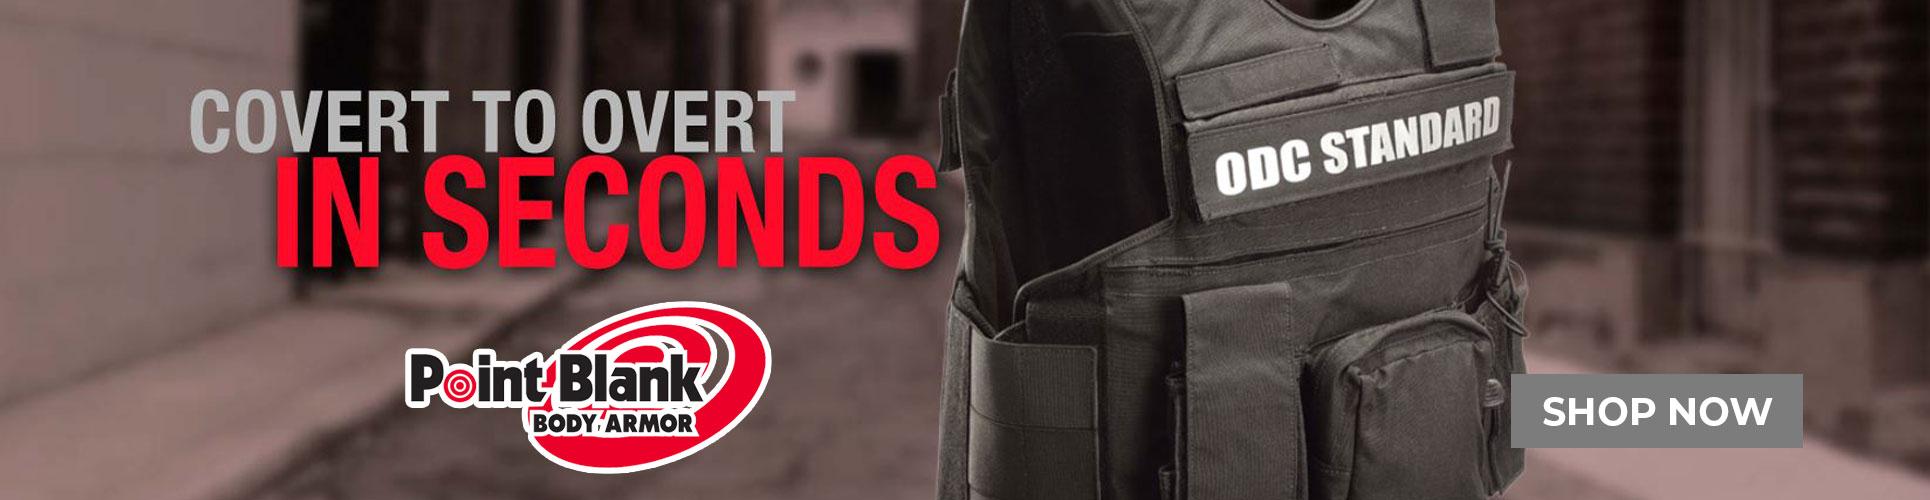 Shop Point Blank Body Armor